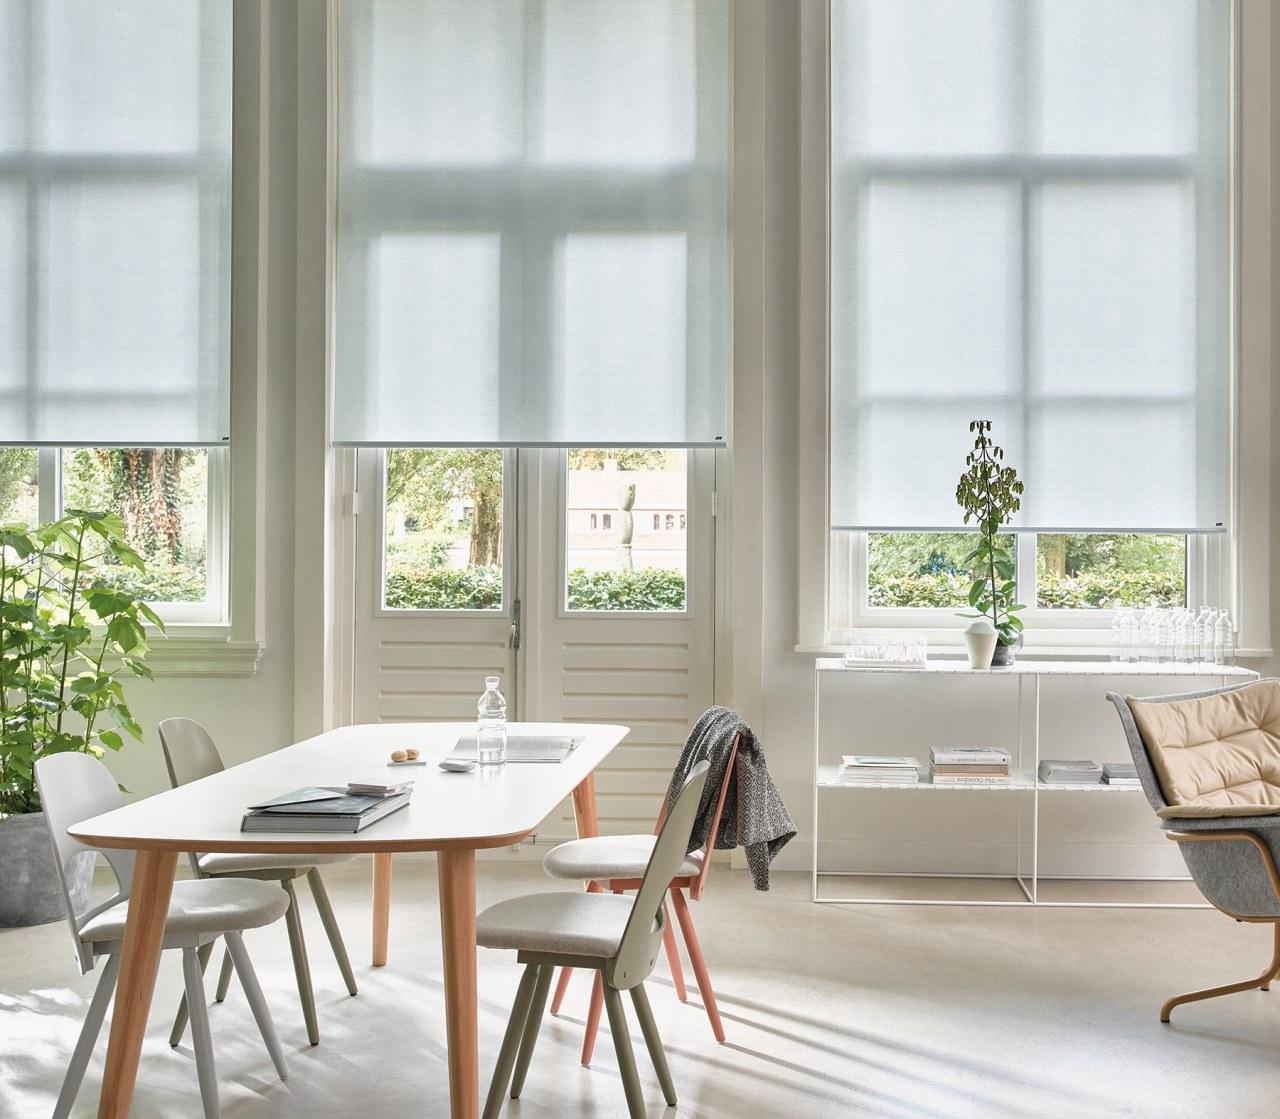 Luxaflex sunscreen blinds filter sunlight while meeting stringent